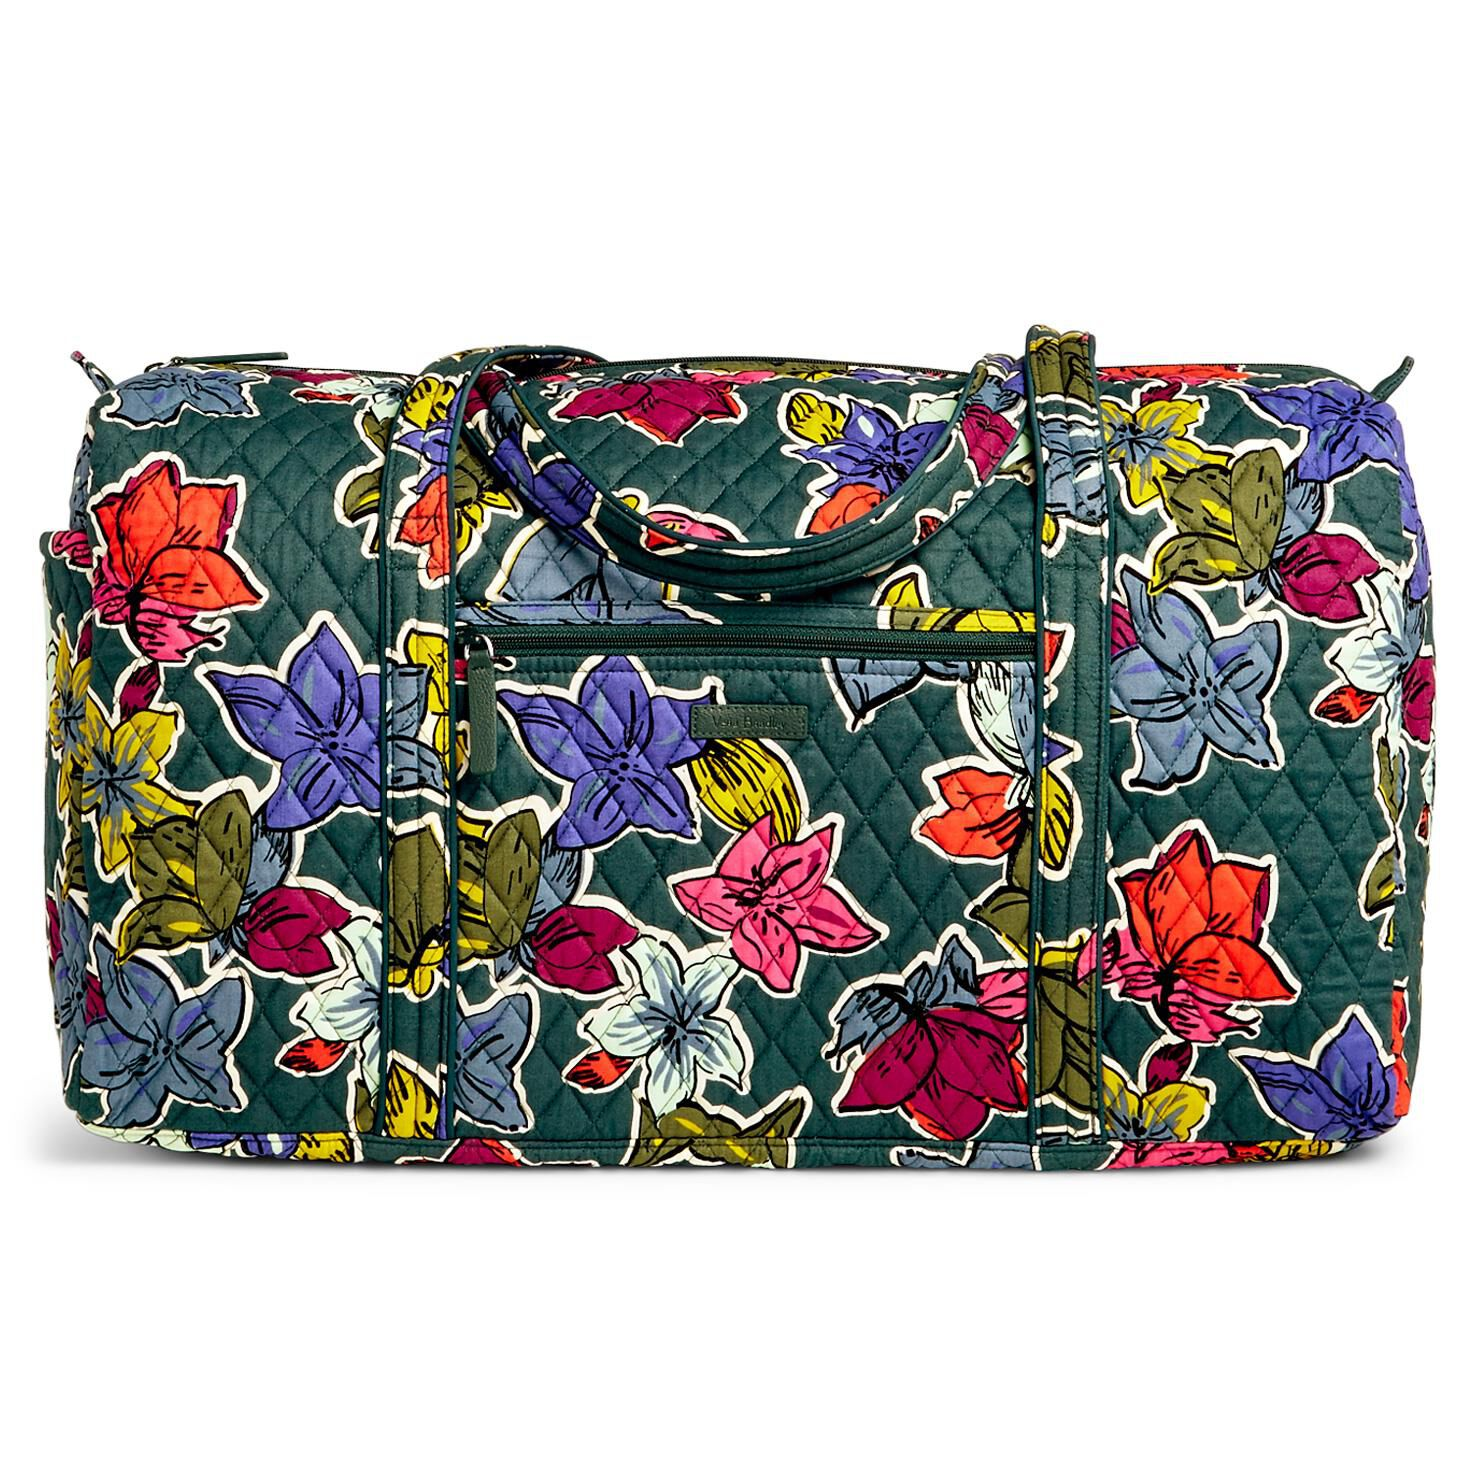 Gym Bag Vera Bradley: Best Vera Bradley Gym Bag